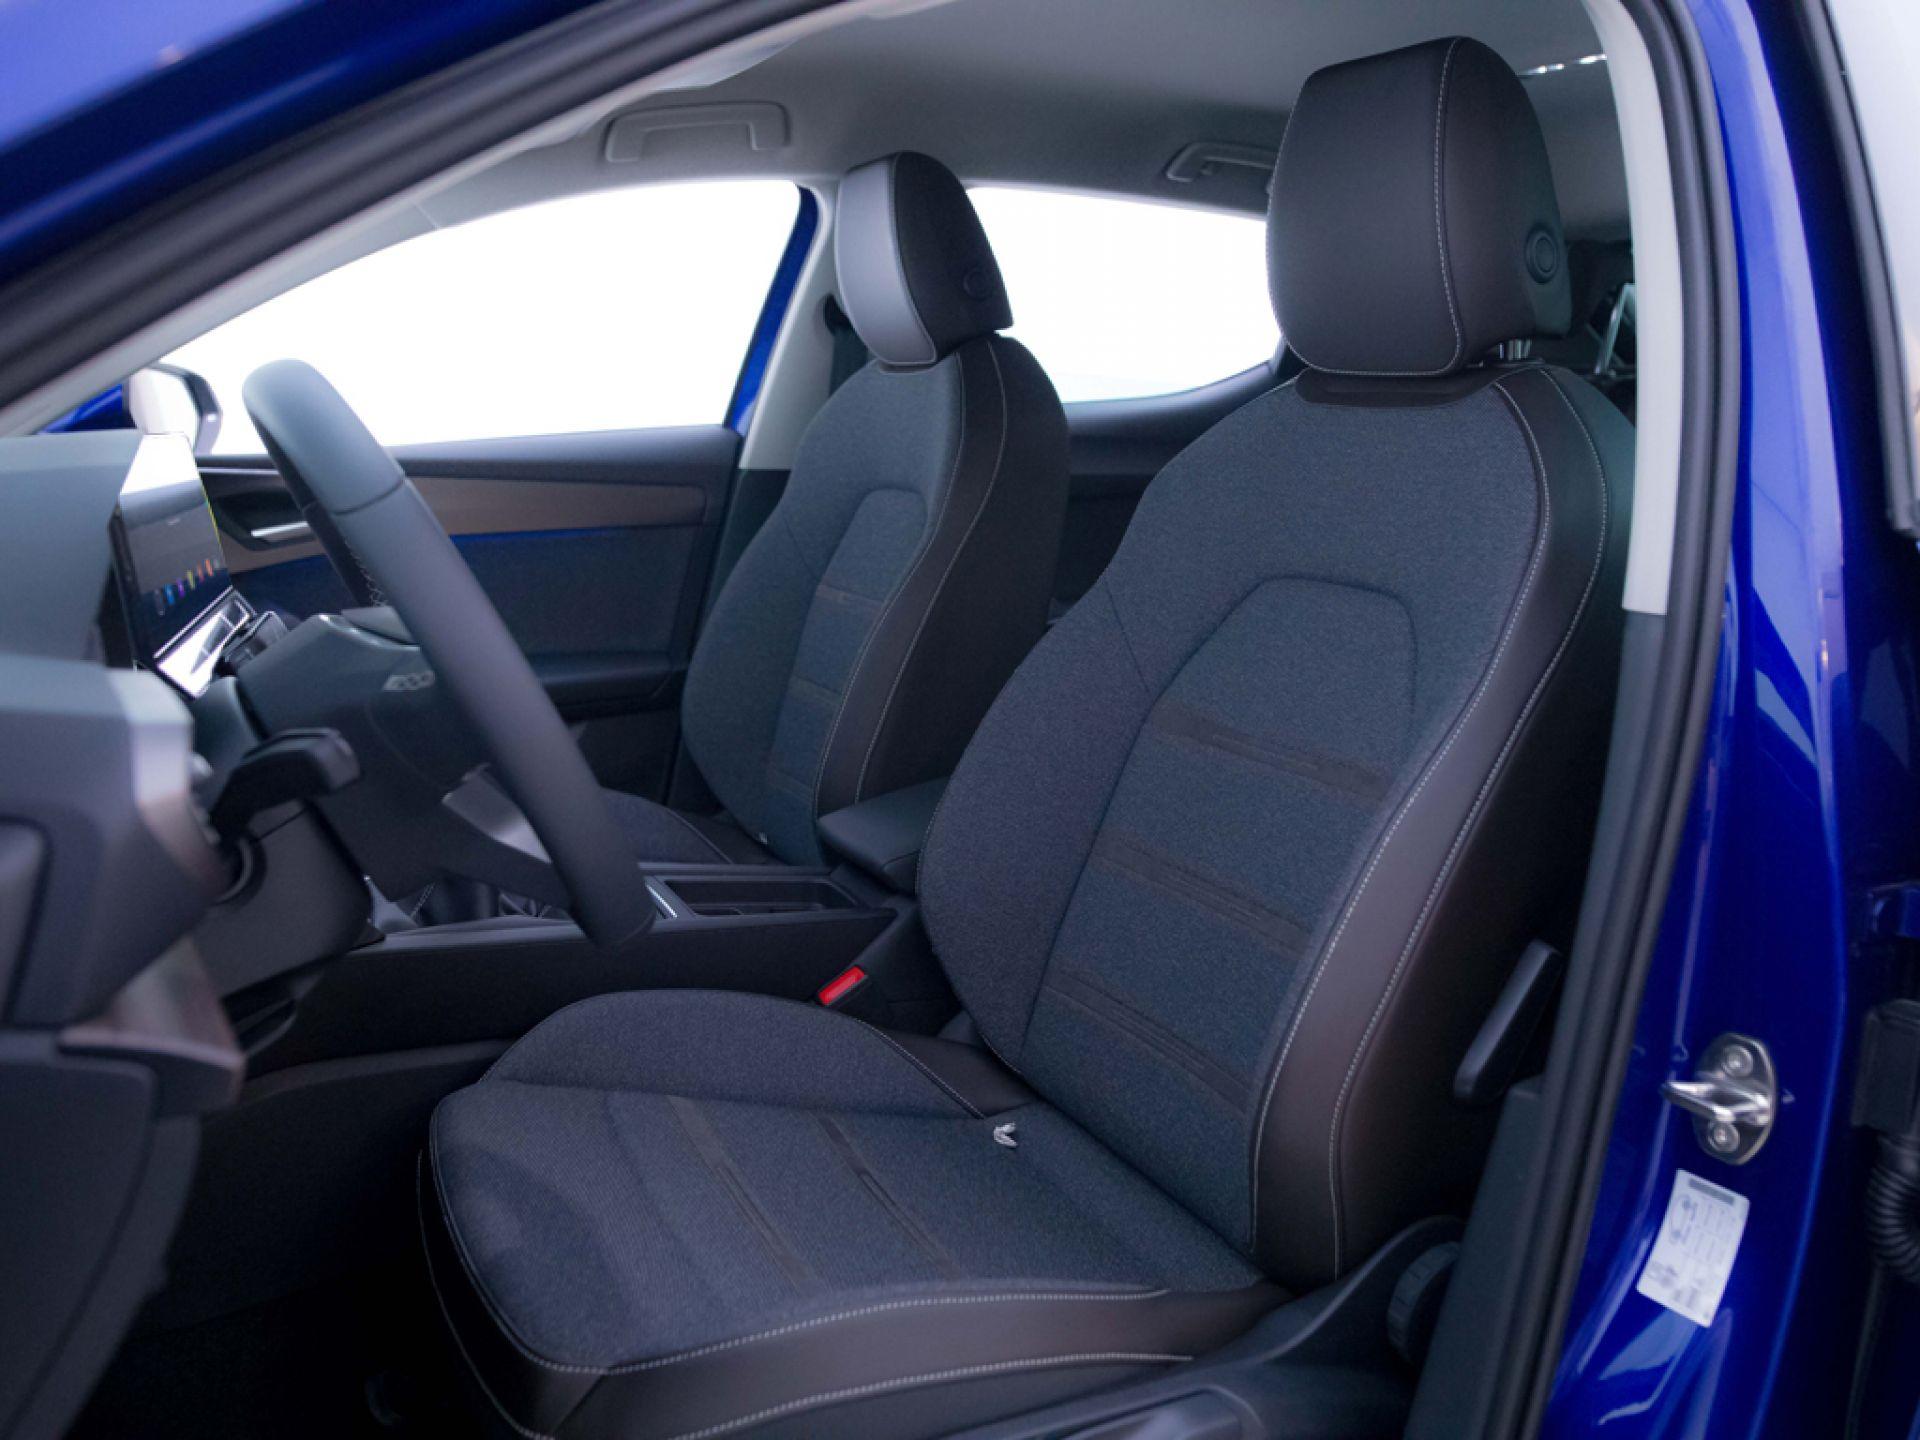 SEAT Leon 1.5 TSI S&S Xcellence Launch P L